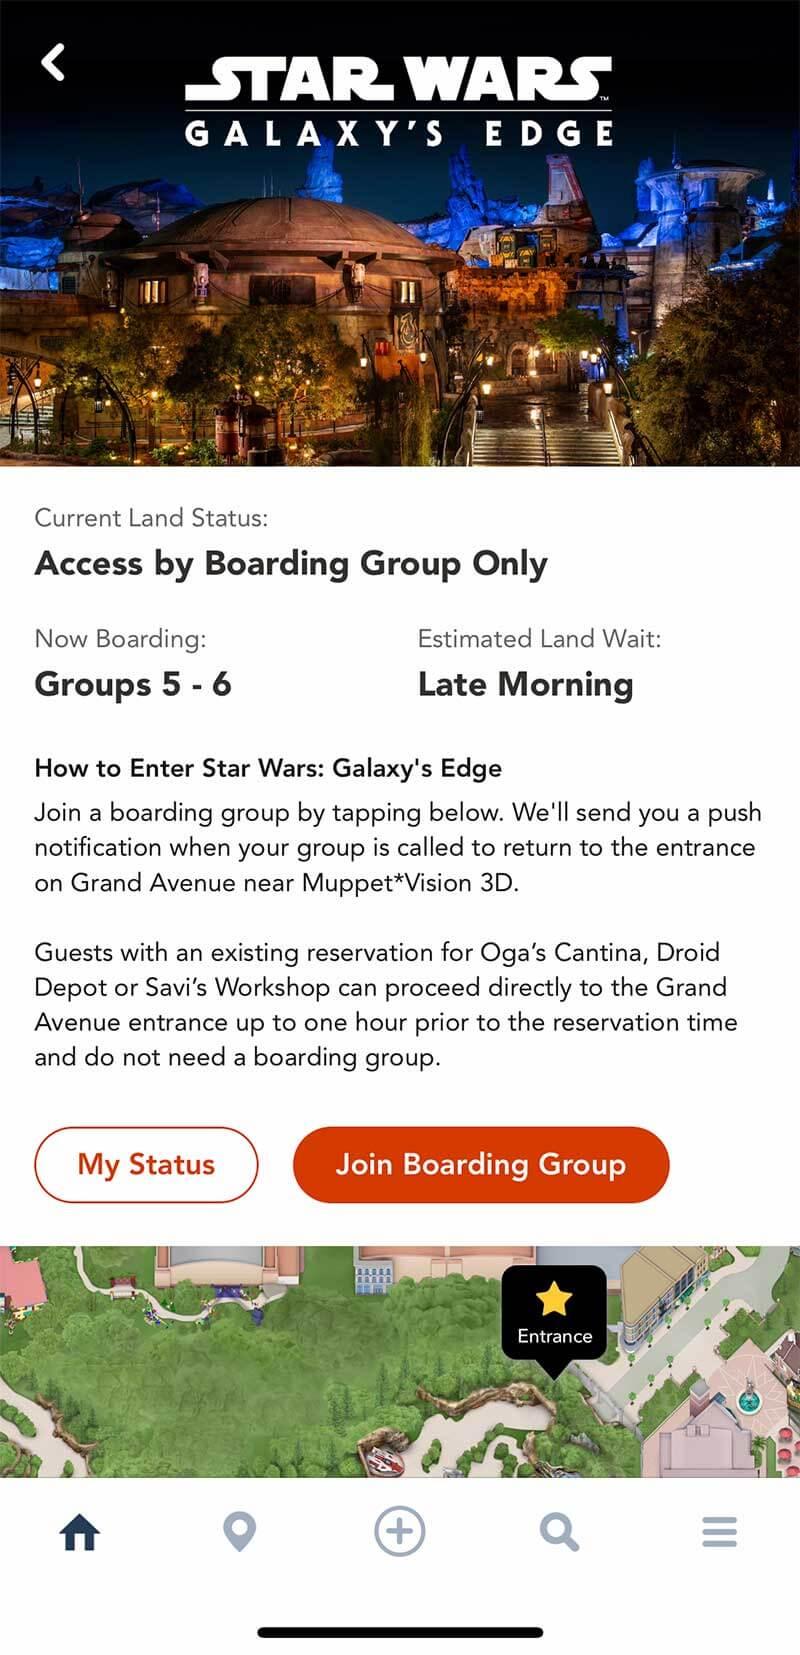 Star Wars: Galaxy's Edge Disney World - My Disney Experience Boarding Group